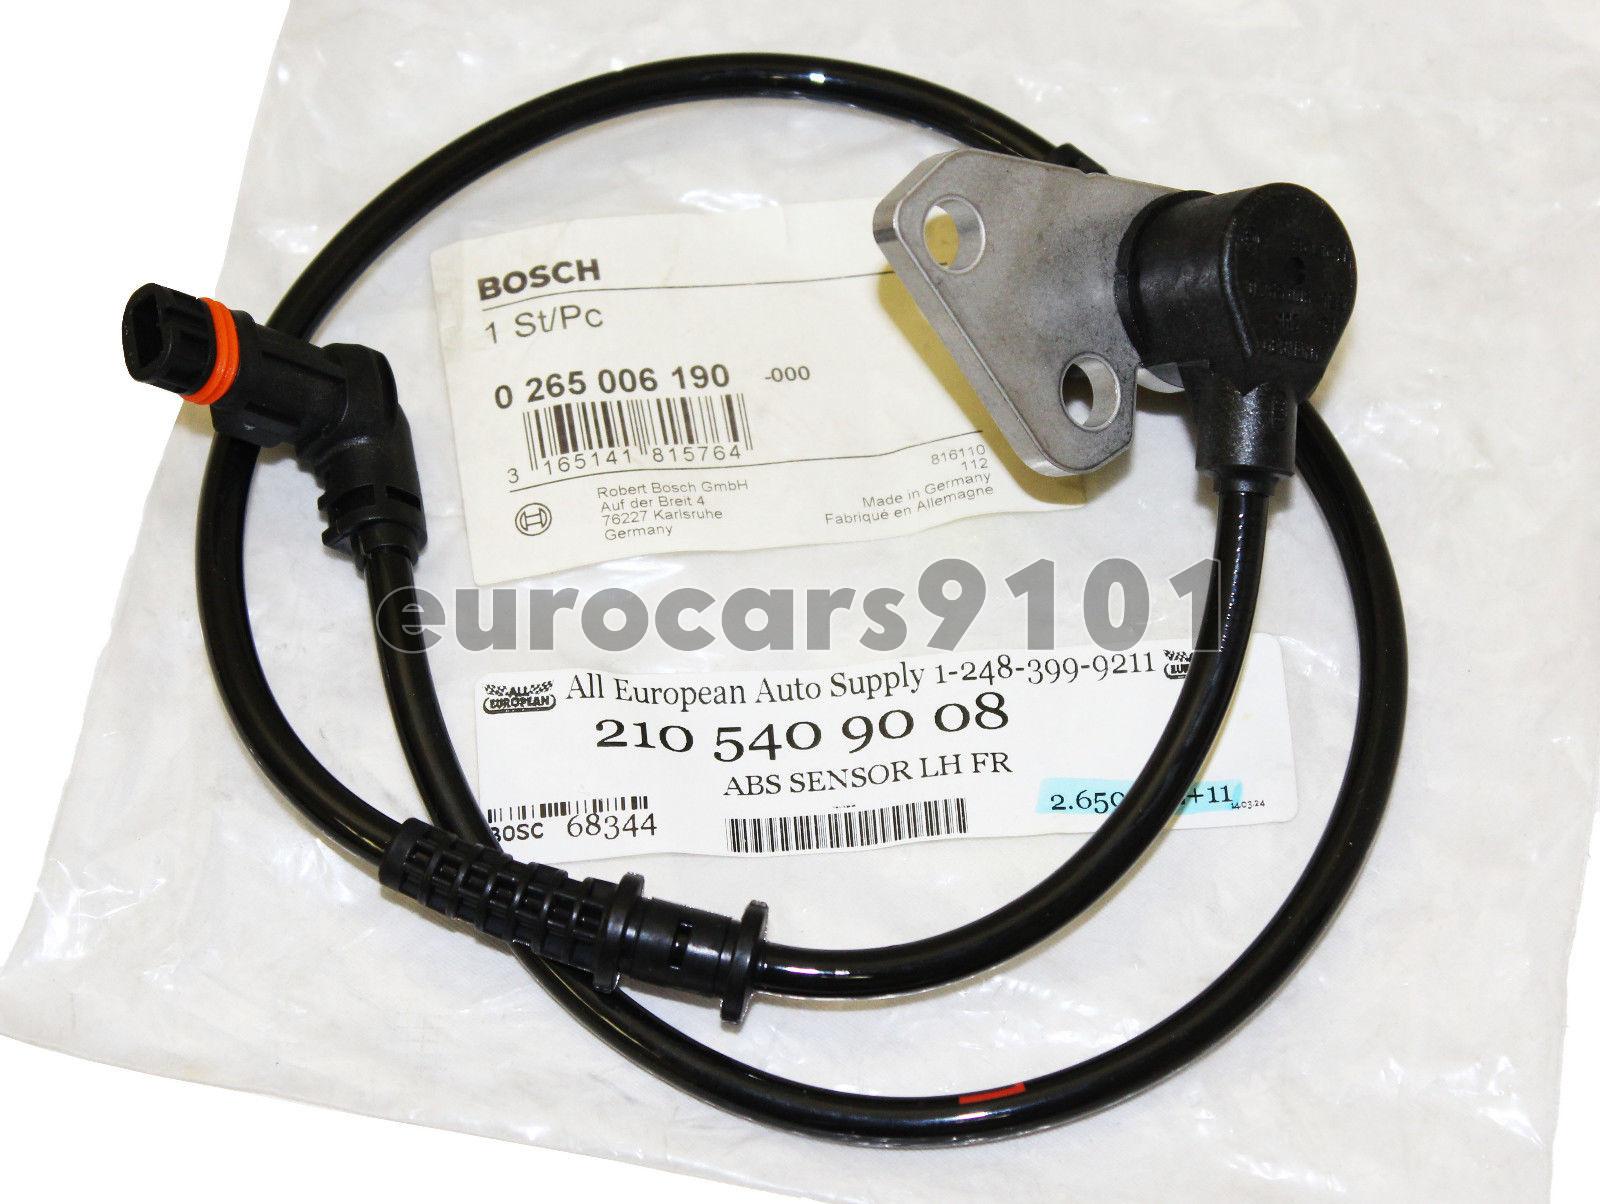 New Front Right ABS Wheel Speed Sensor fits Mercedes W210 E300 E320 E420 E430